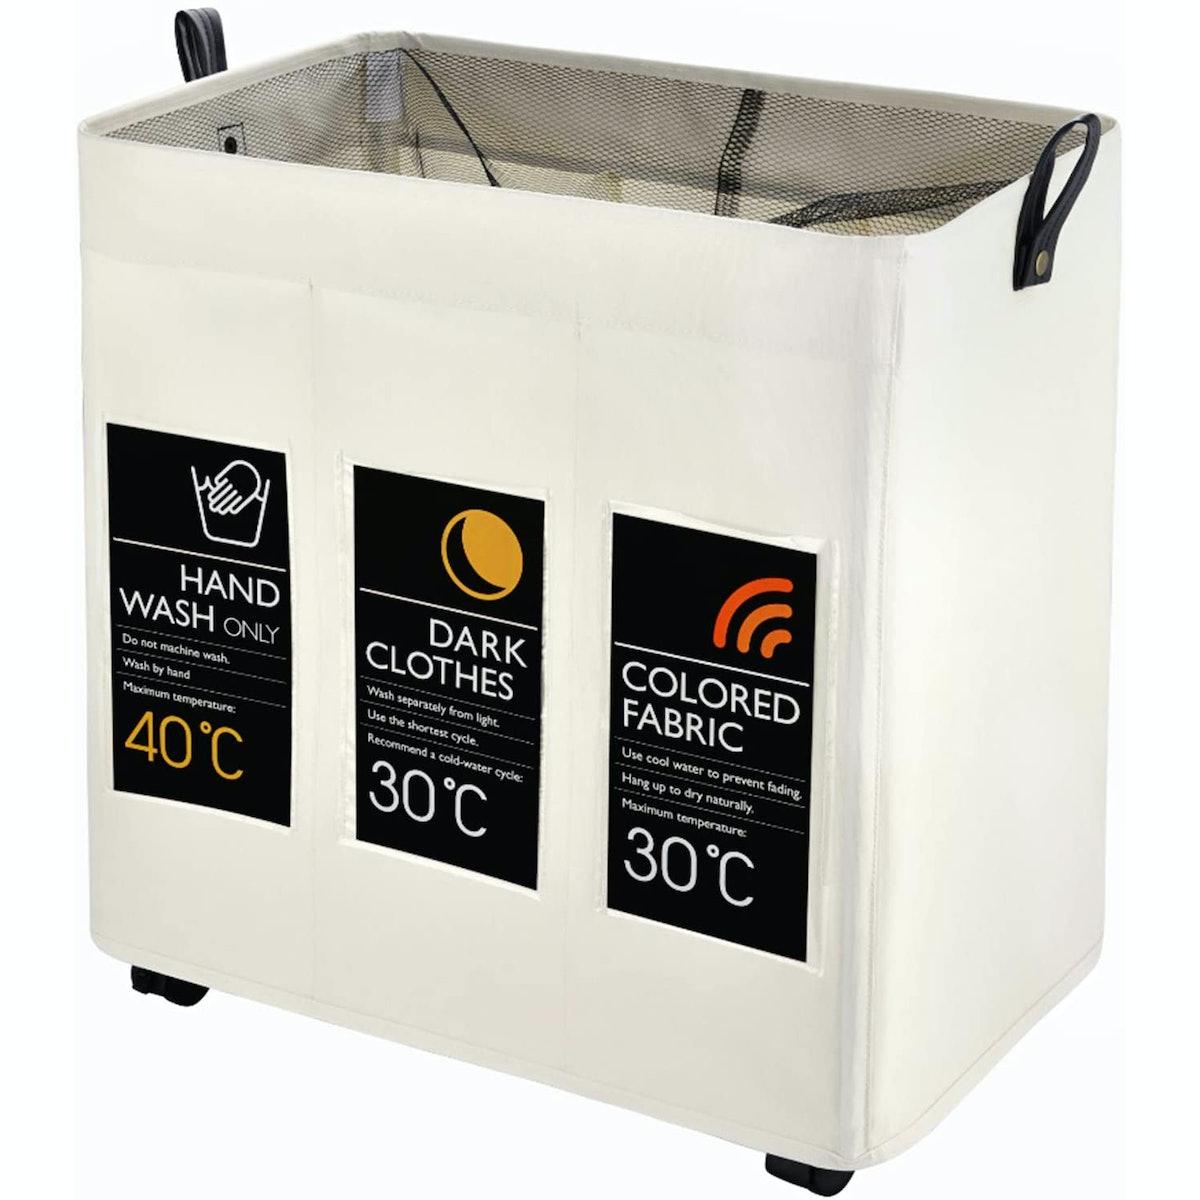 Caroeas 3-Bag Laundry Sorter